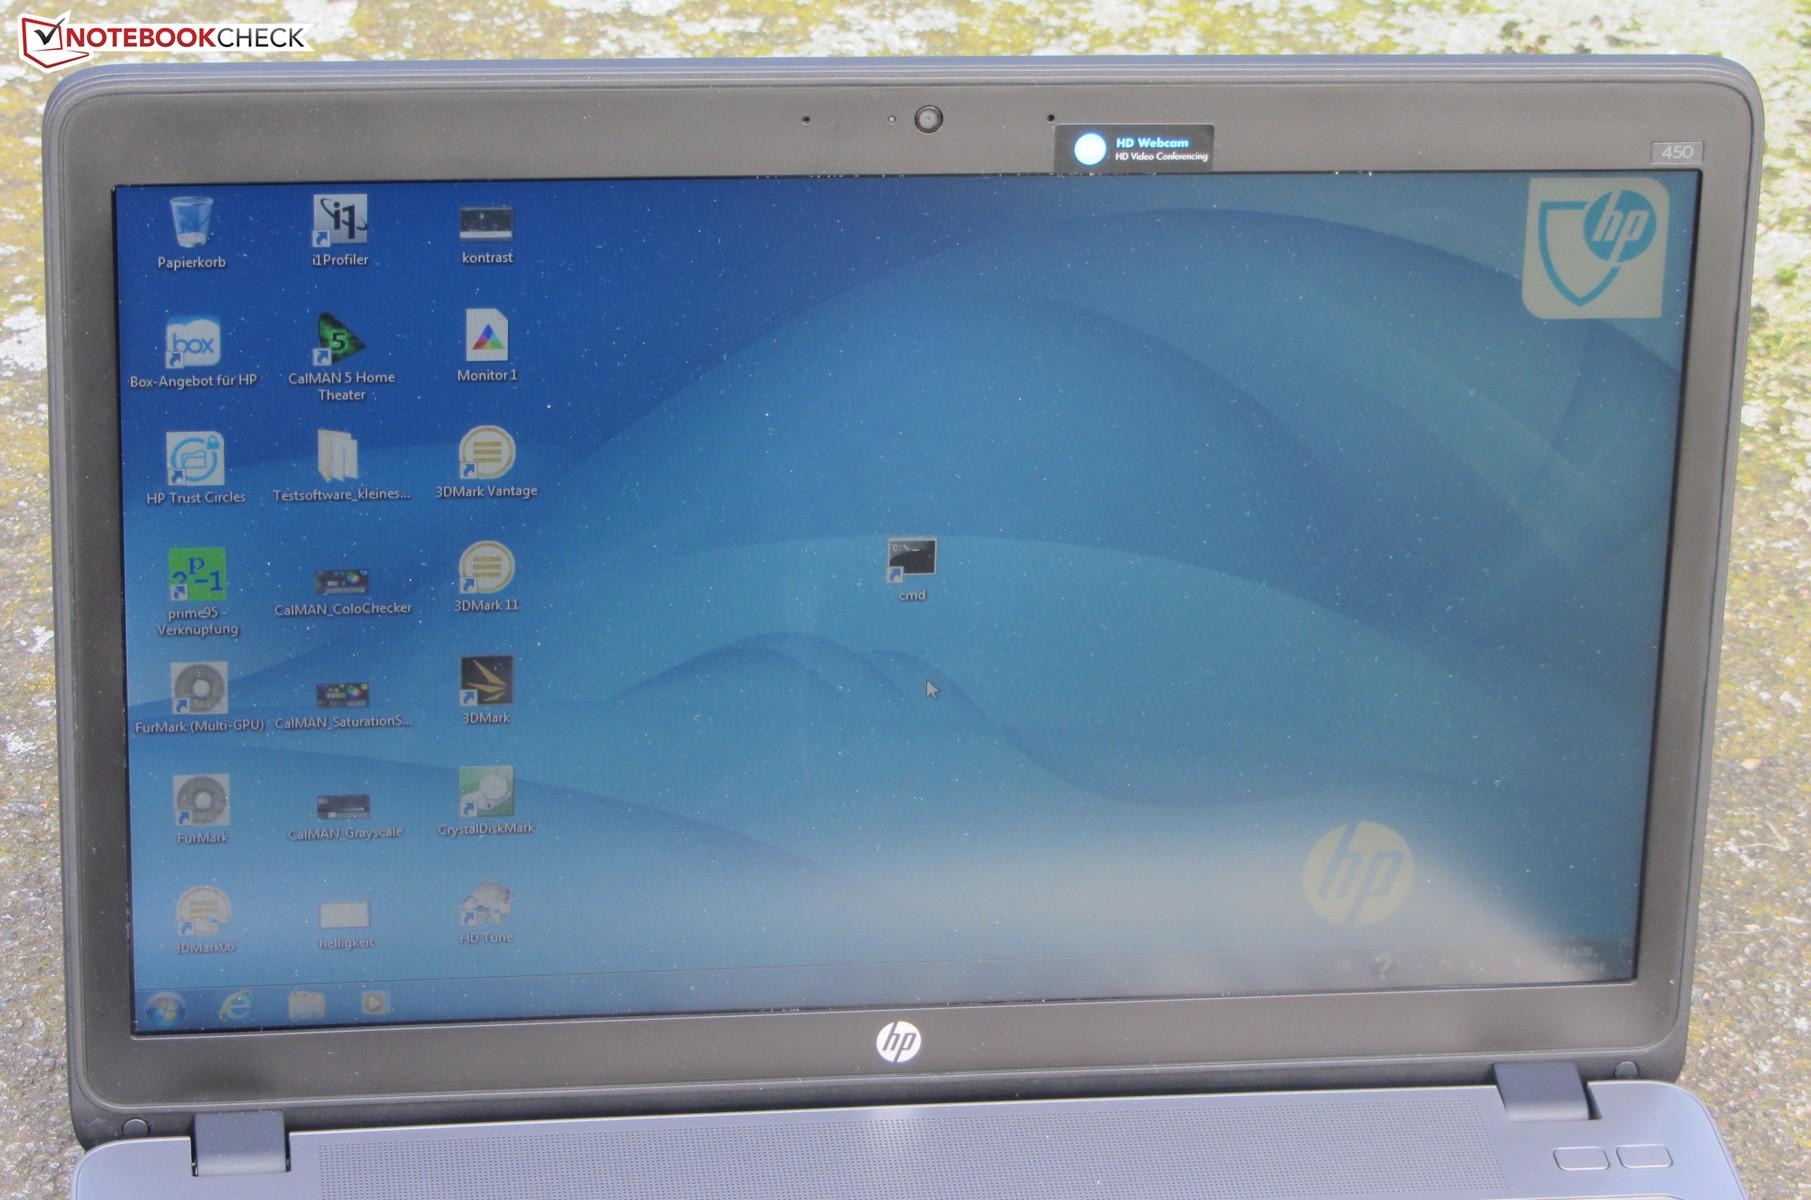 HP PROBOOK 470 G1 AMD GRAPHICS WINDOWS 10 DRIVER DOWNLOAD